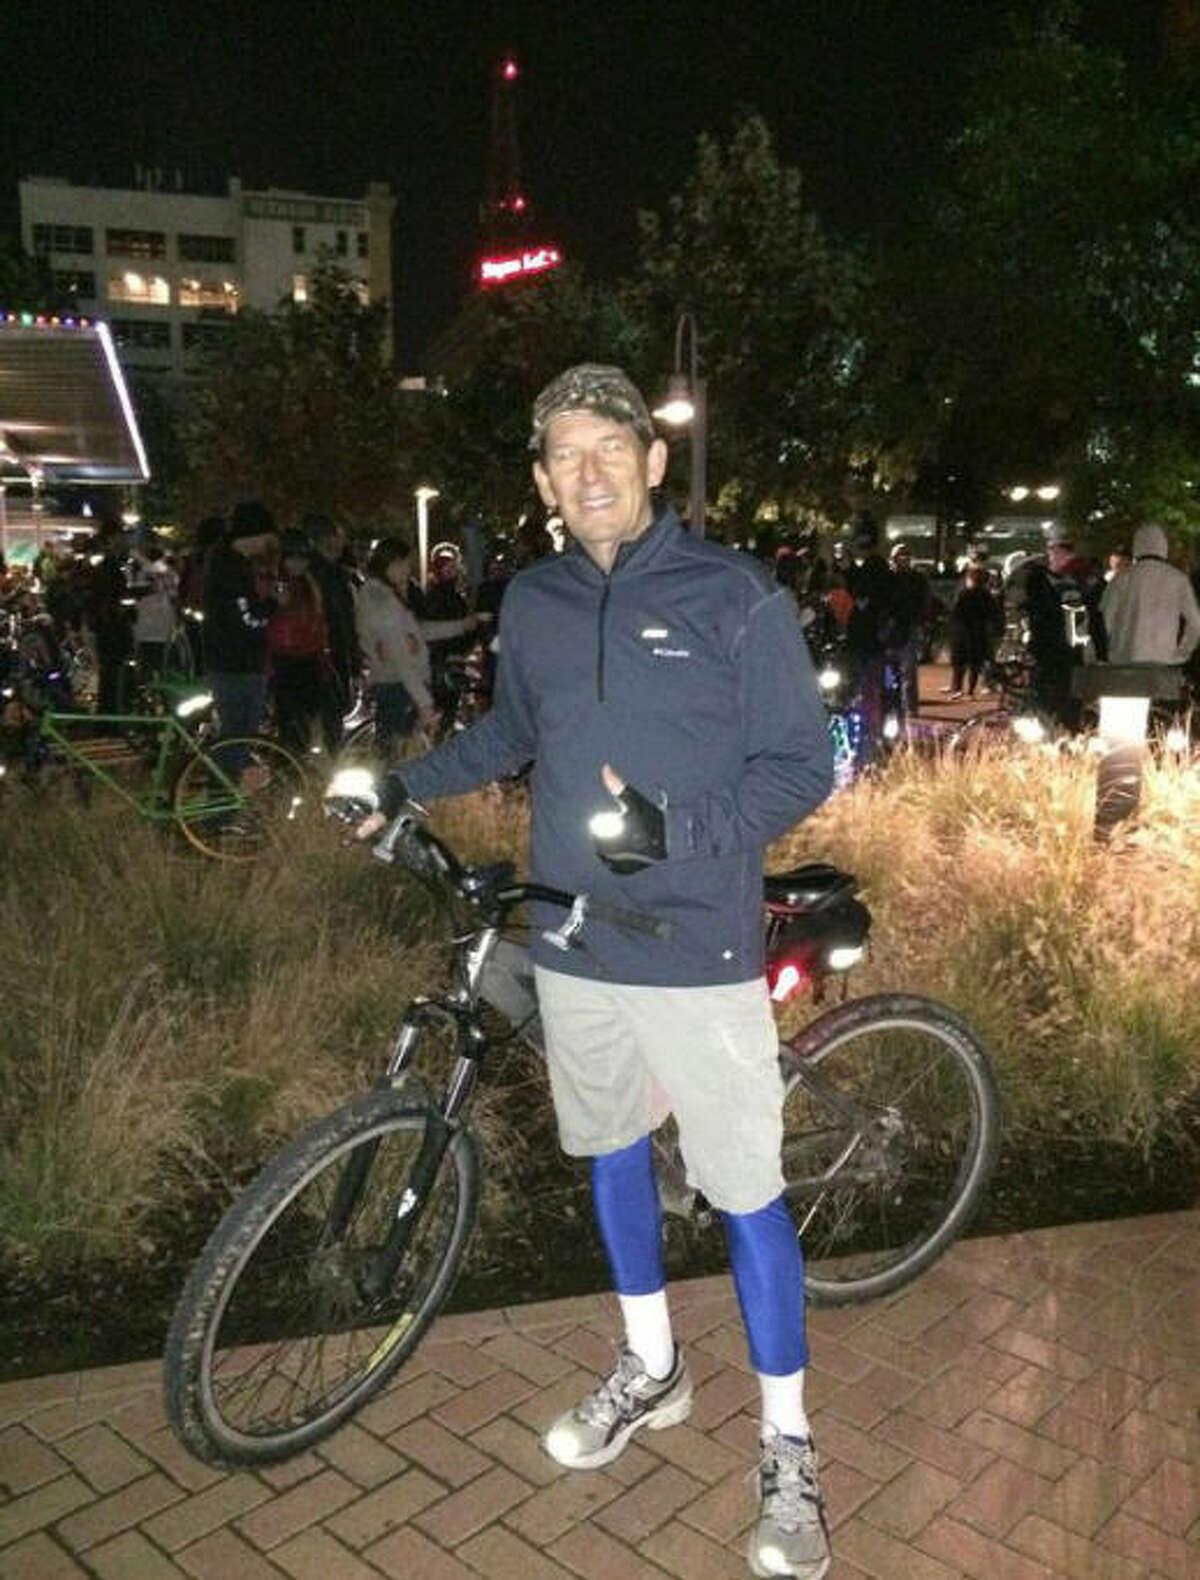 Richard Houser on recent Critical Mass Houston ride (Courtesy of Anthony Simpson)